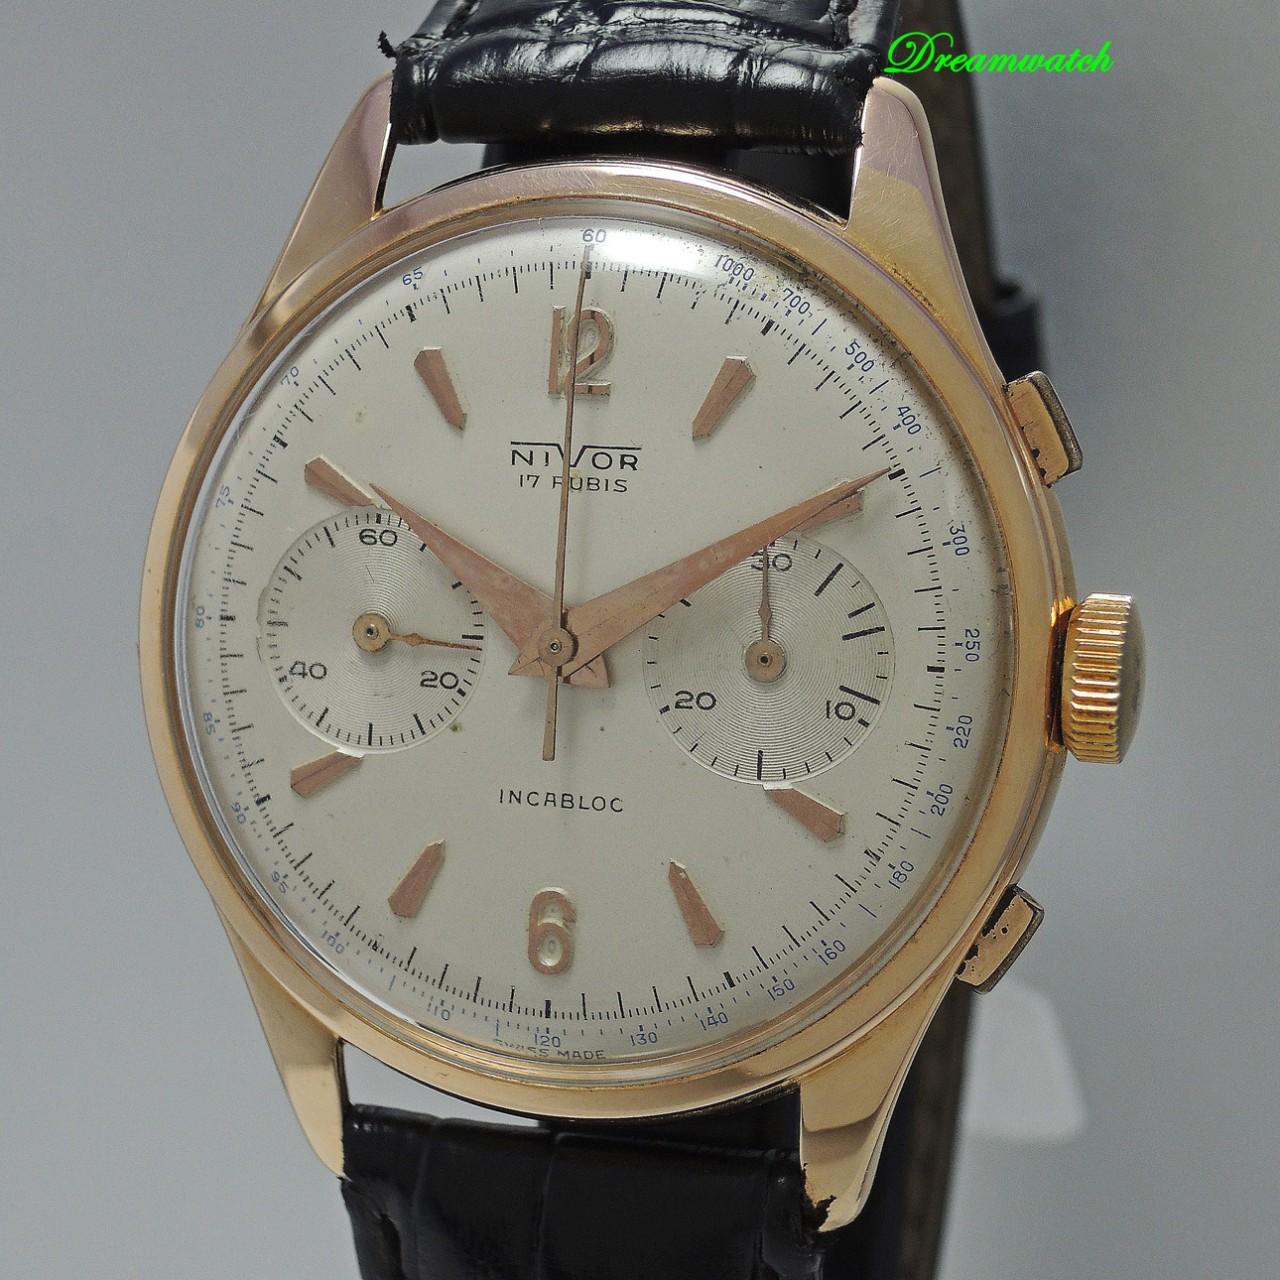 Nivor Vintage Chronograph 18k Rotgold Valjoux 23